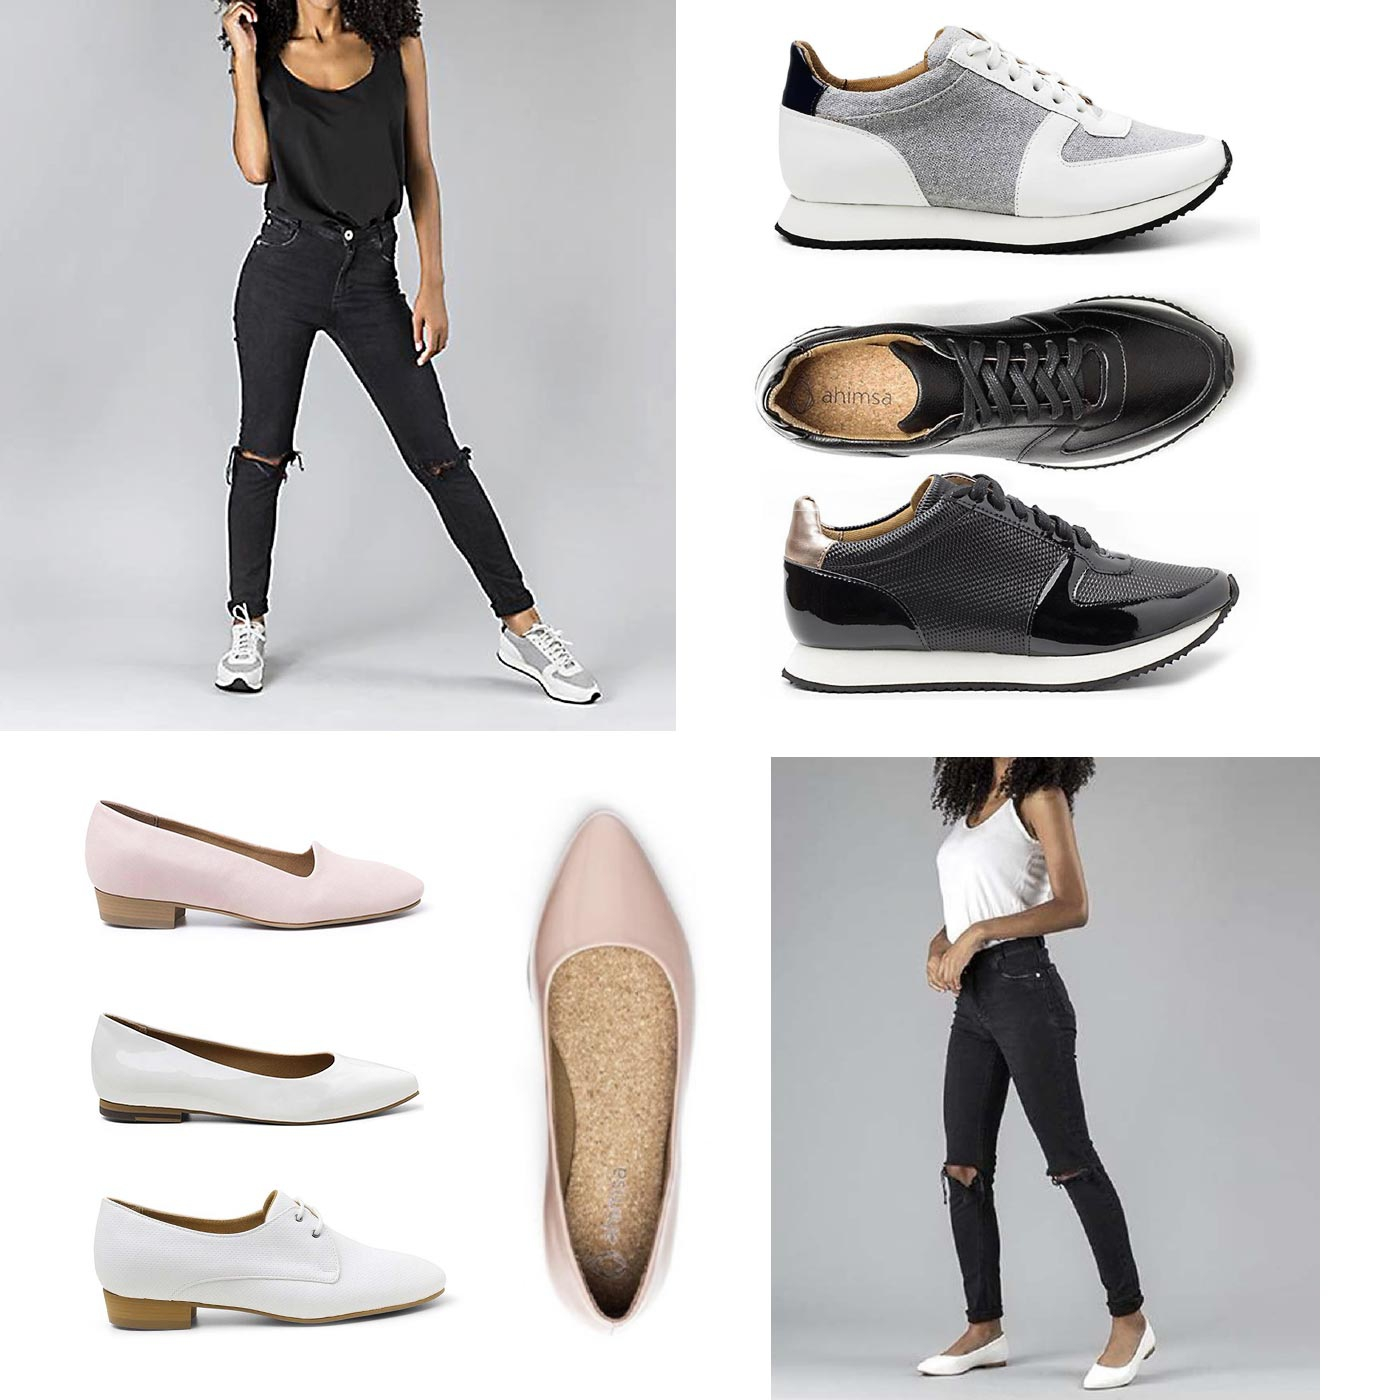 NEU | Vegane Sneaker und Schuhe von AHIMSA jetzt shoppen!